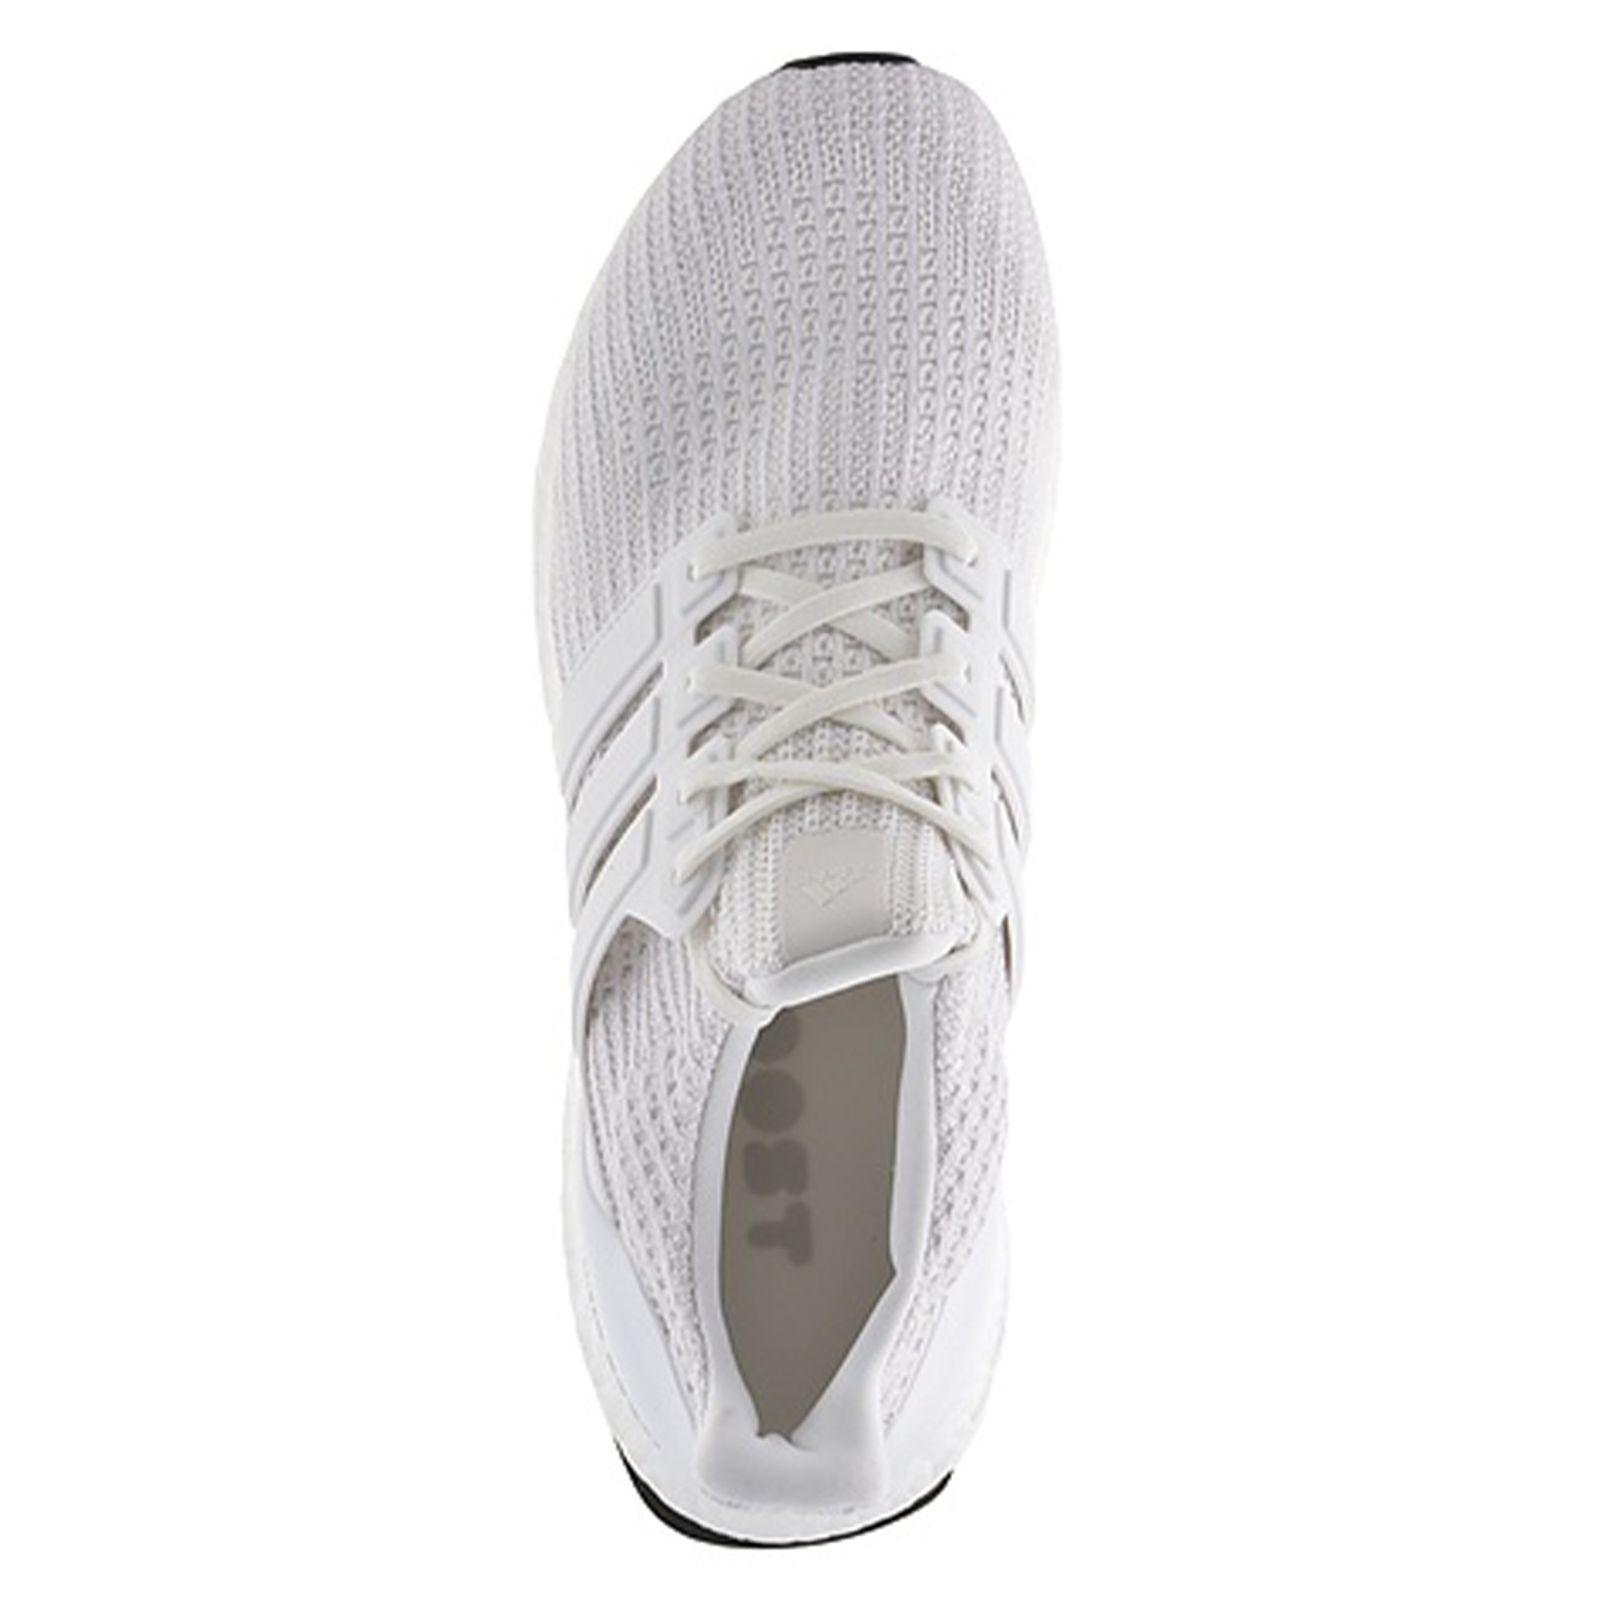 کفش مخصوص دویدن زنانه آدیداس مدل ULTRABOOST - سفيد - 3